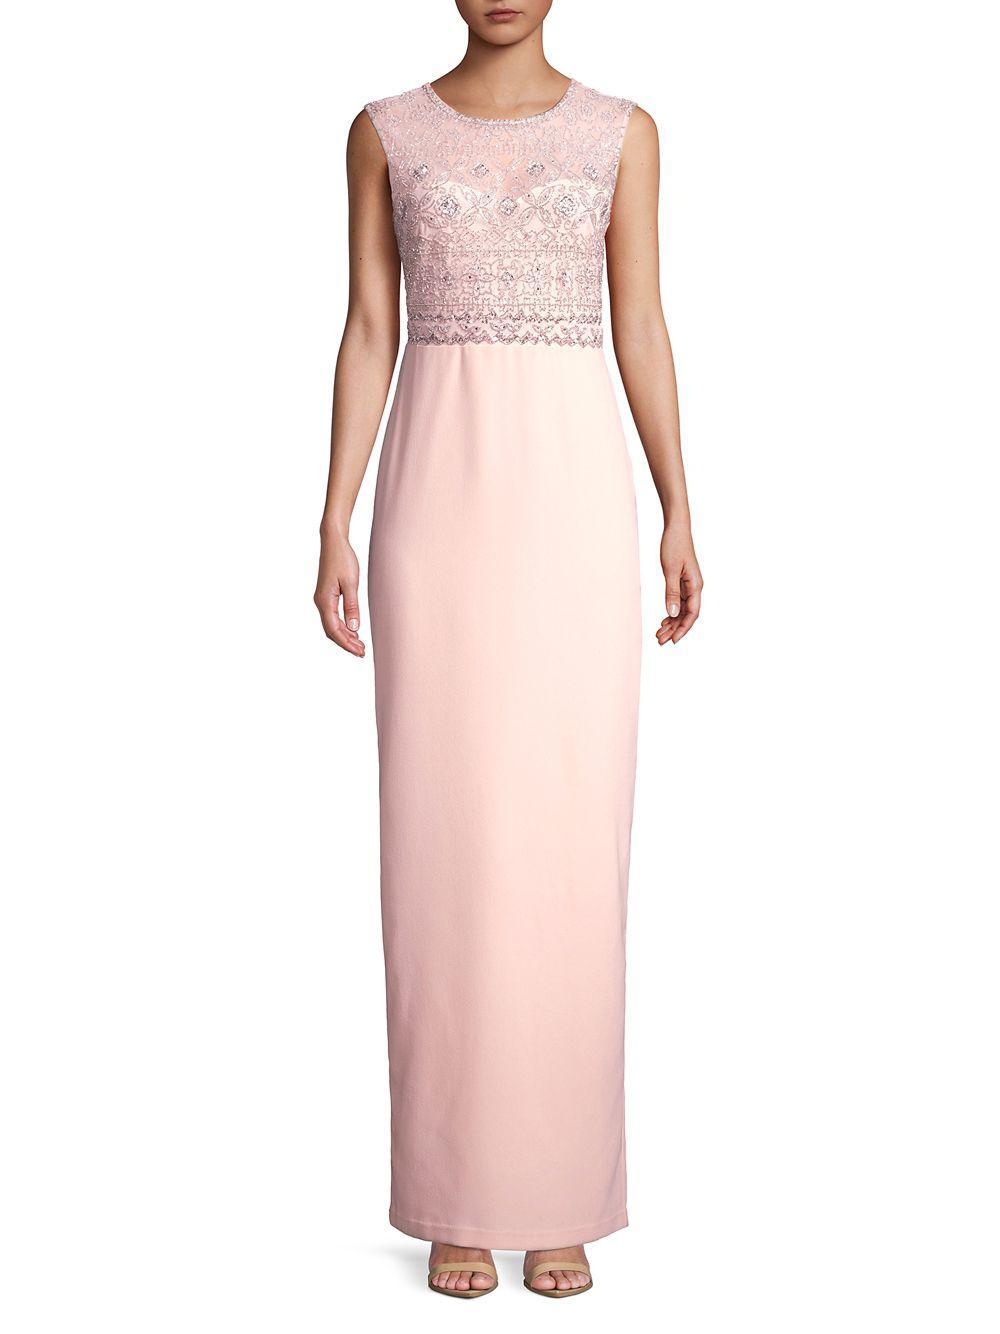 12021d45bedfa Lyst - Adrianna Papell Beaded Sleeveless Long Dress in Pink